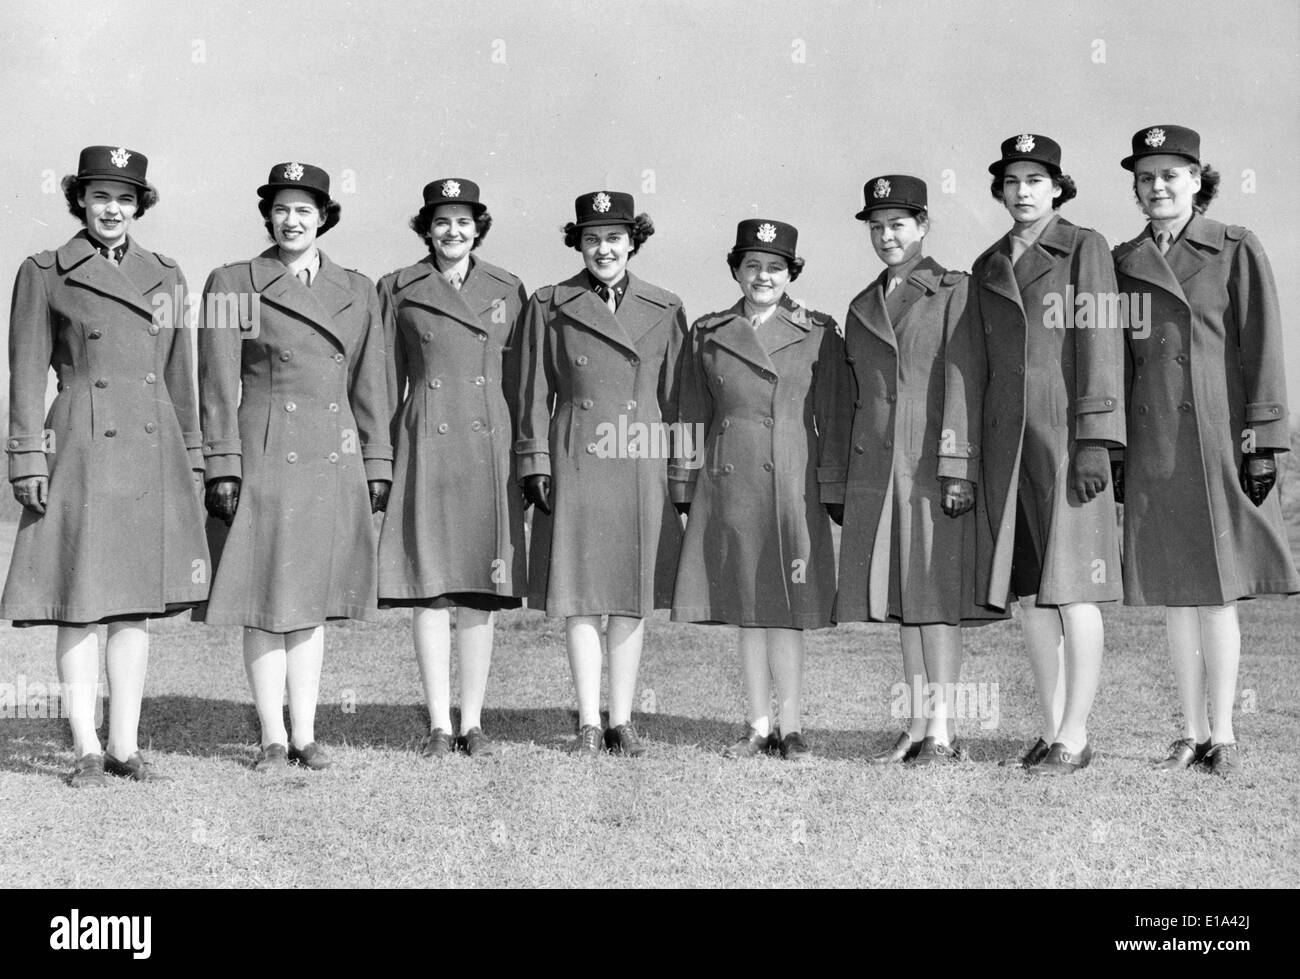 Ww2 Uniform Women High Resolution Stock Photography And